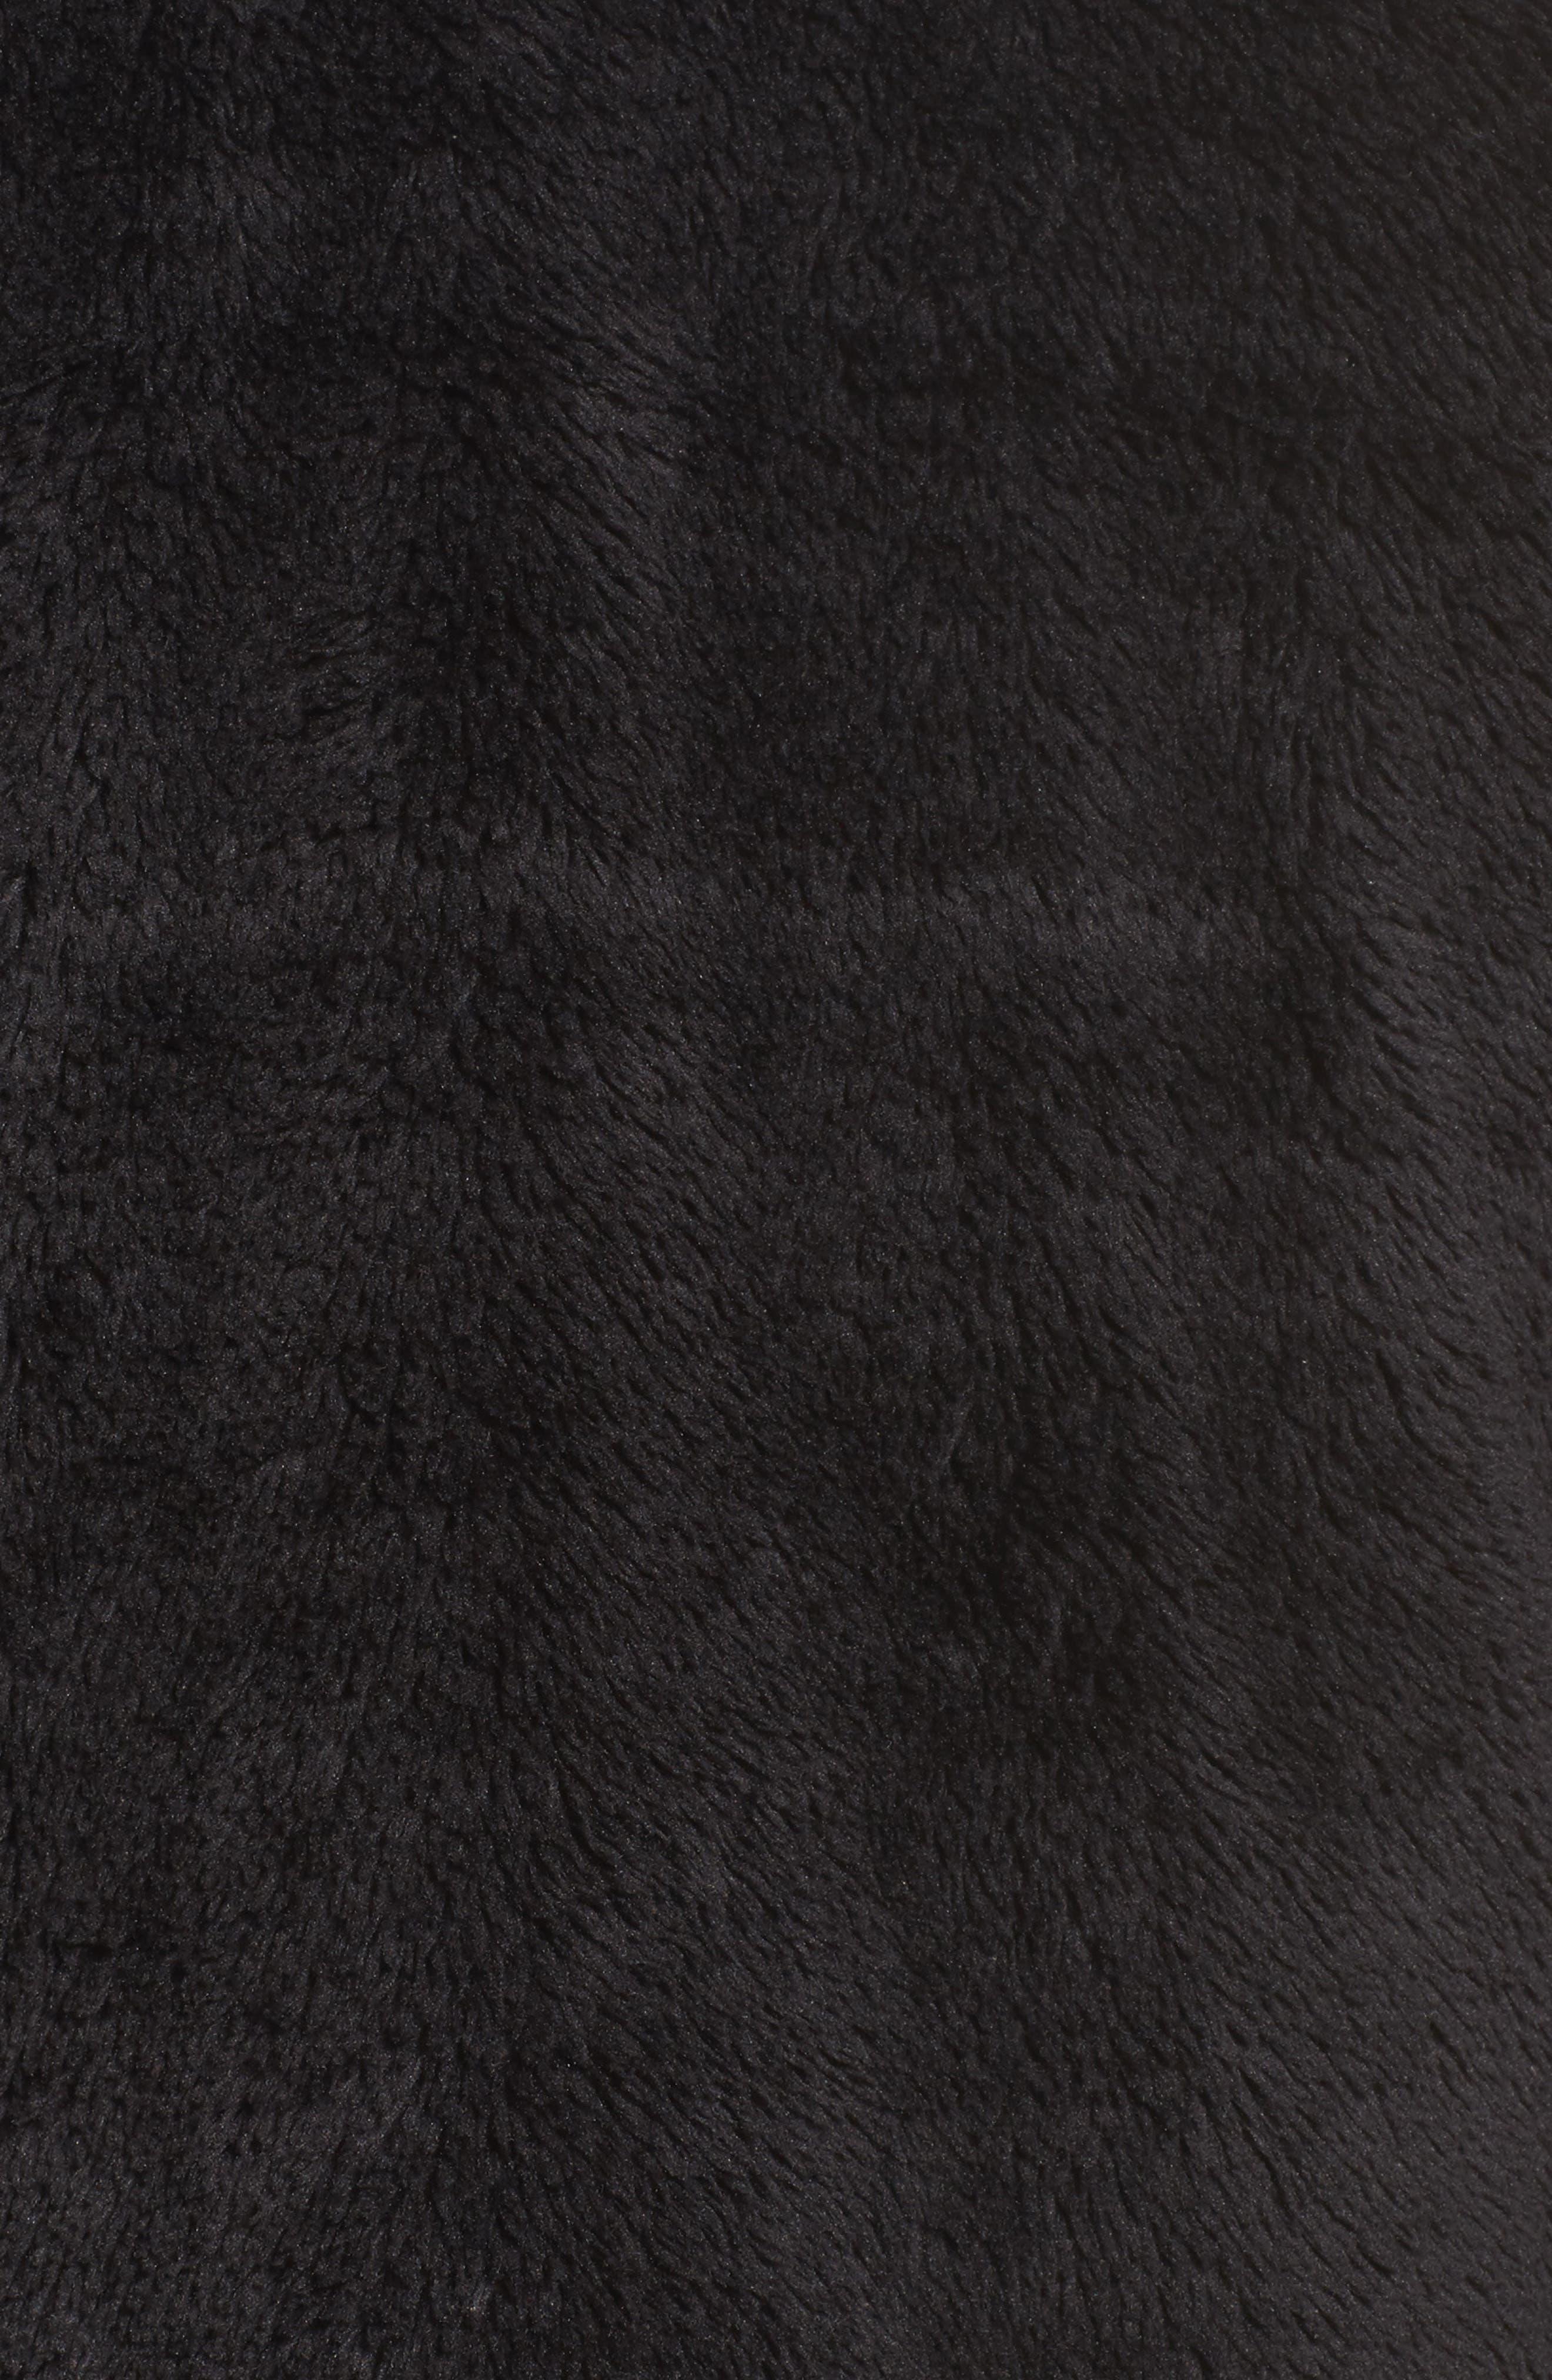 Furry Fleece Jacket,                             Alternate thumbnail 7, color,                             TNF BLACK